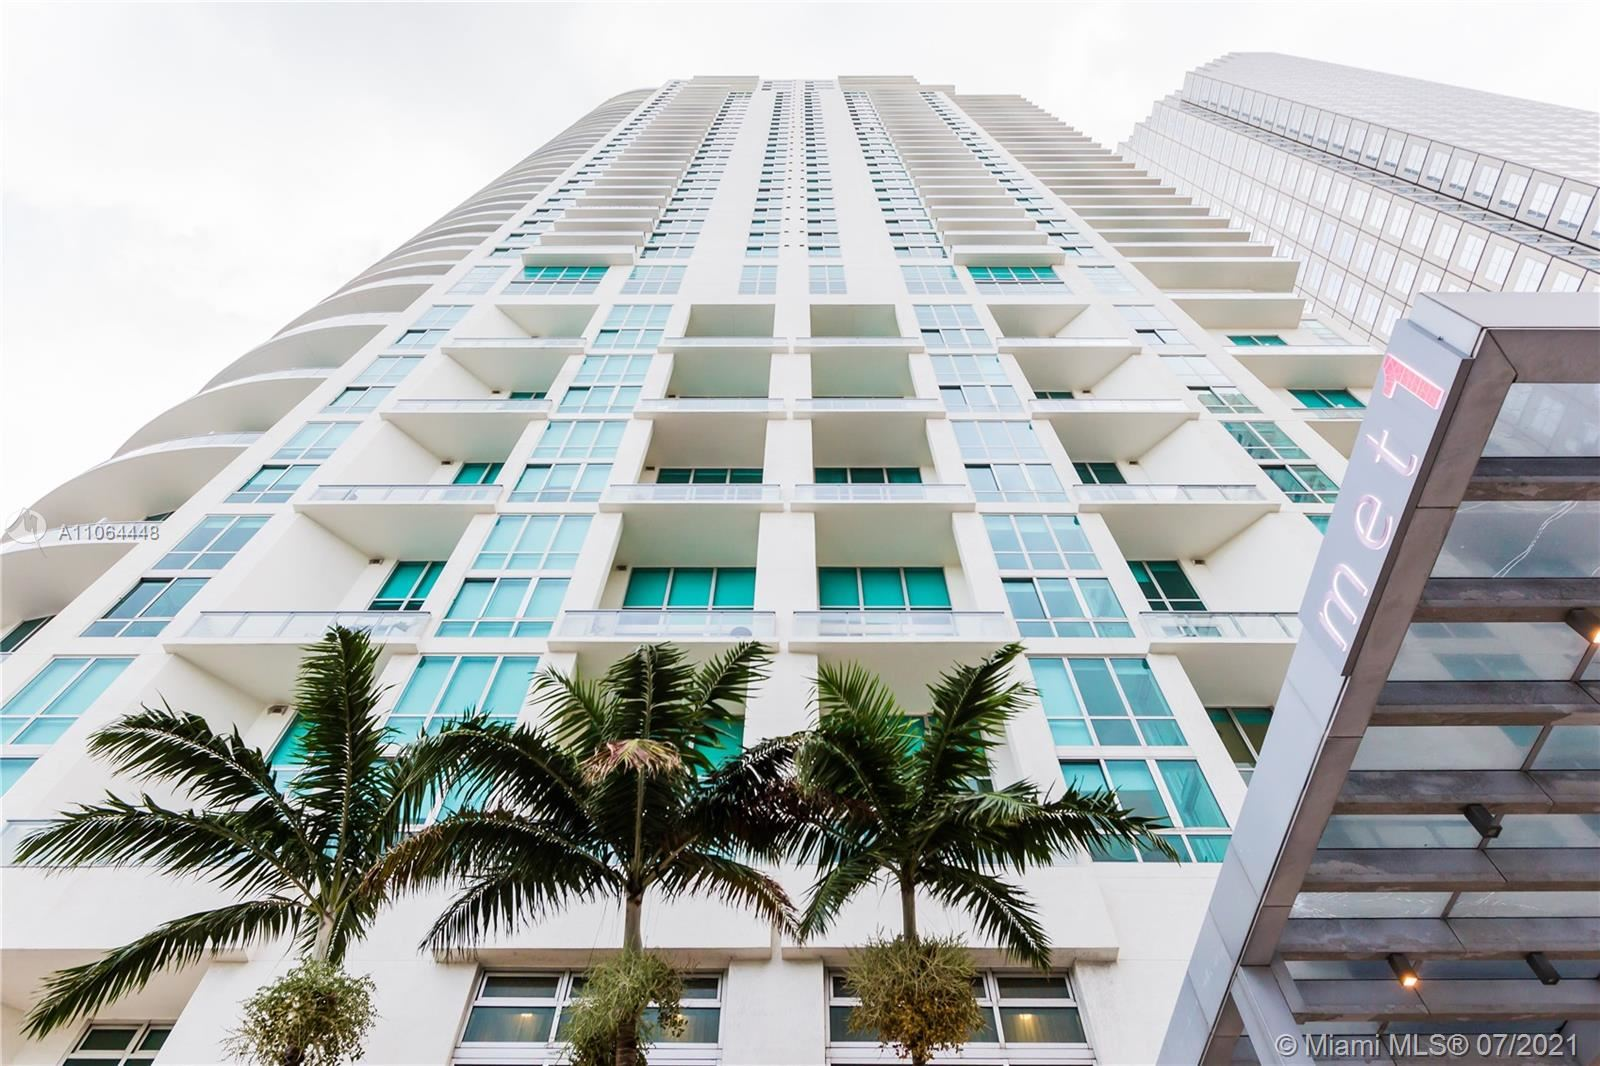 300 S Biscayne Blvd #L-402, Miami, FL 33131 - #: A11064448